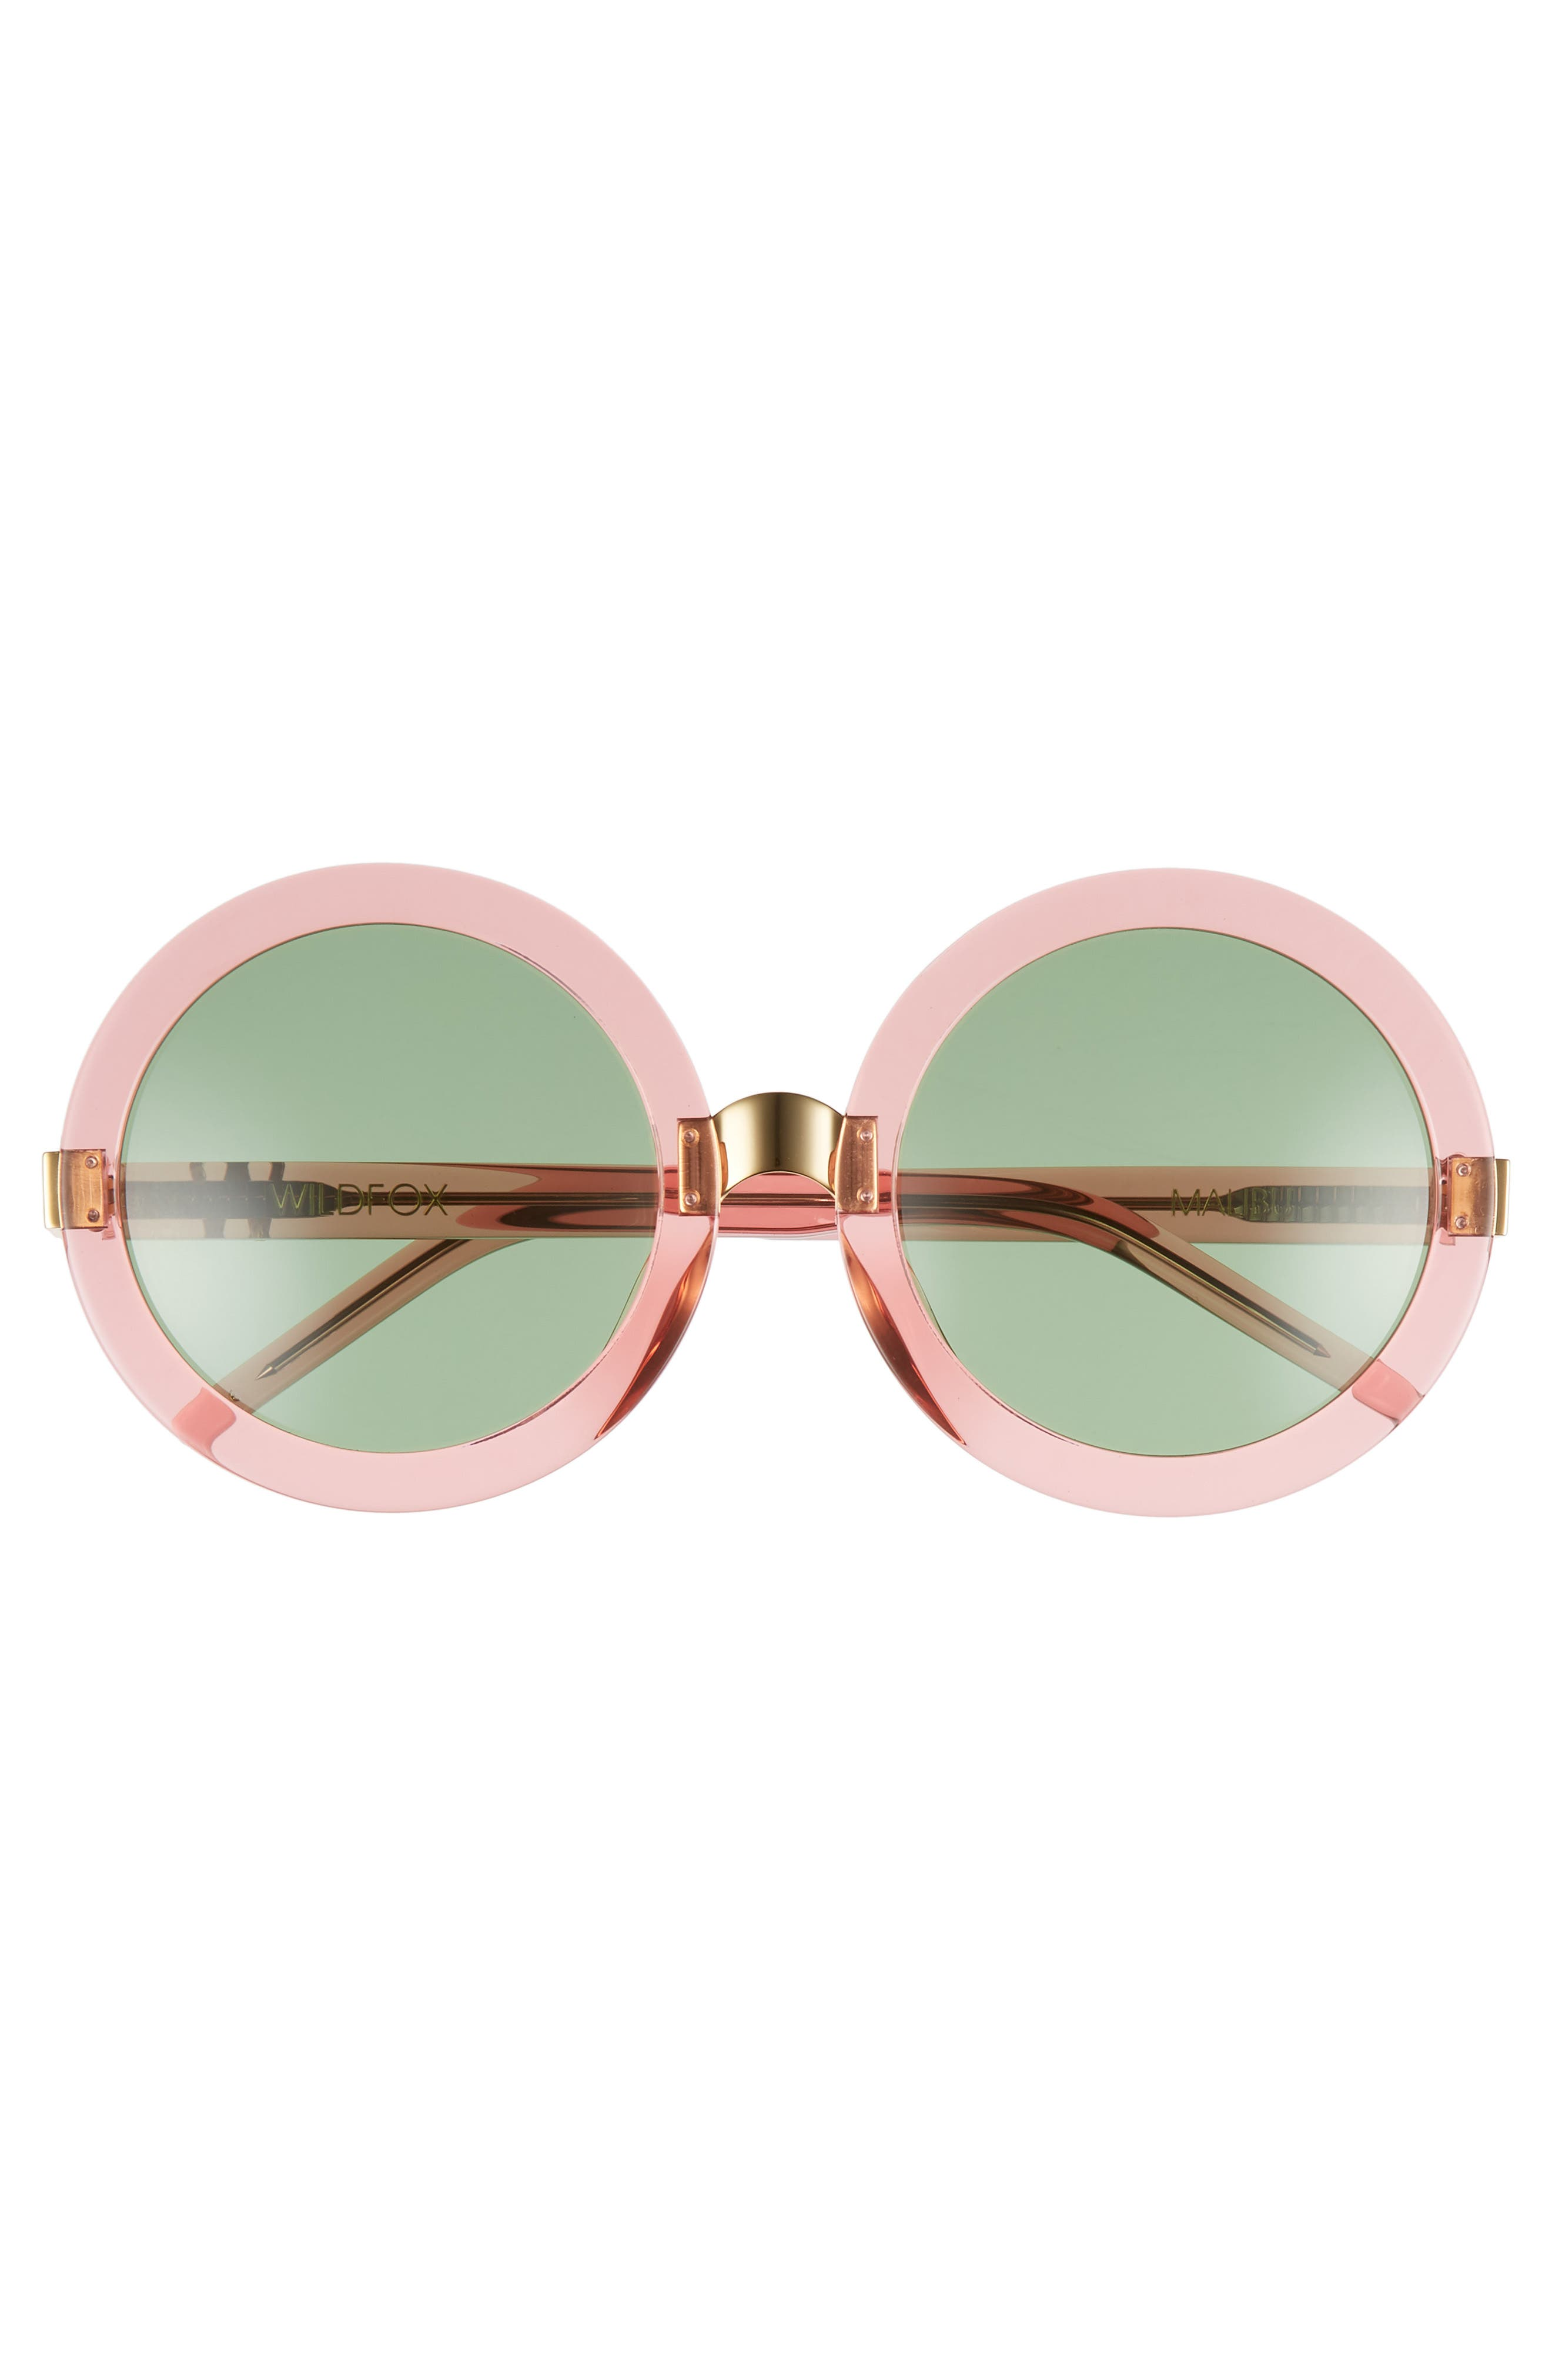 'Malibu' 56mm Round Sunglasses,                             Alternate thumbnail 3, color,                             Rosewater/ Bottle Green